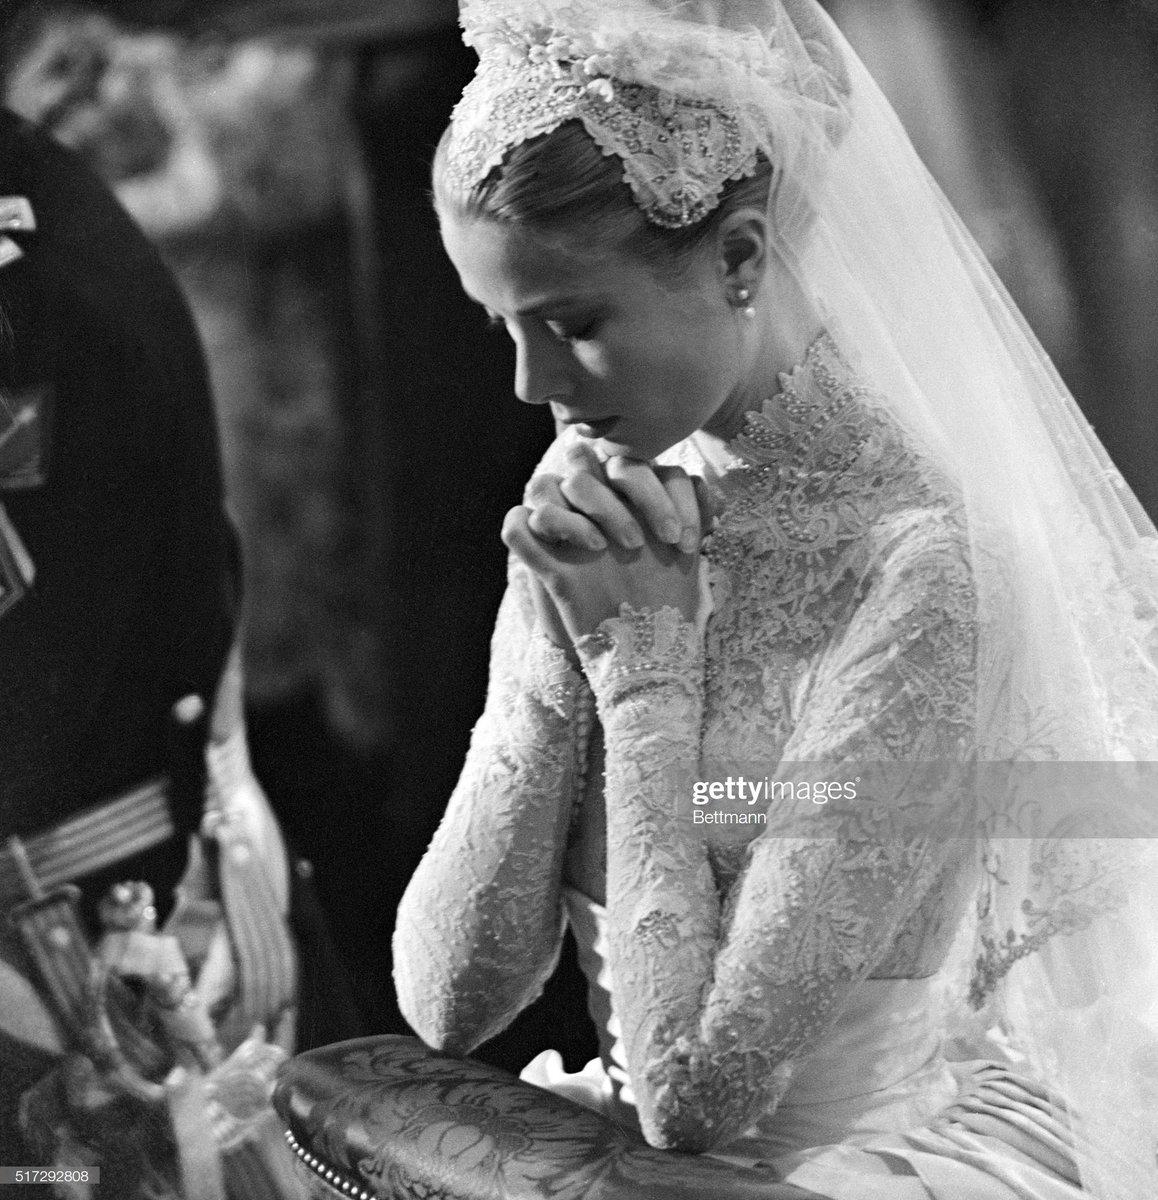 #GraceKelly prays during her wedding to #PrinceRainierofMonaco on April 20th, 1956. pic.twitter.com/AAdqhBZAYM